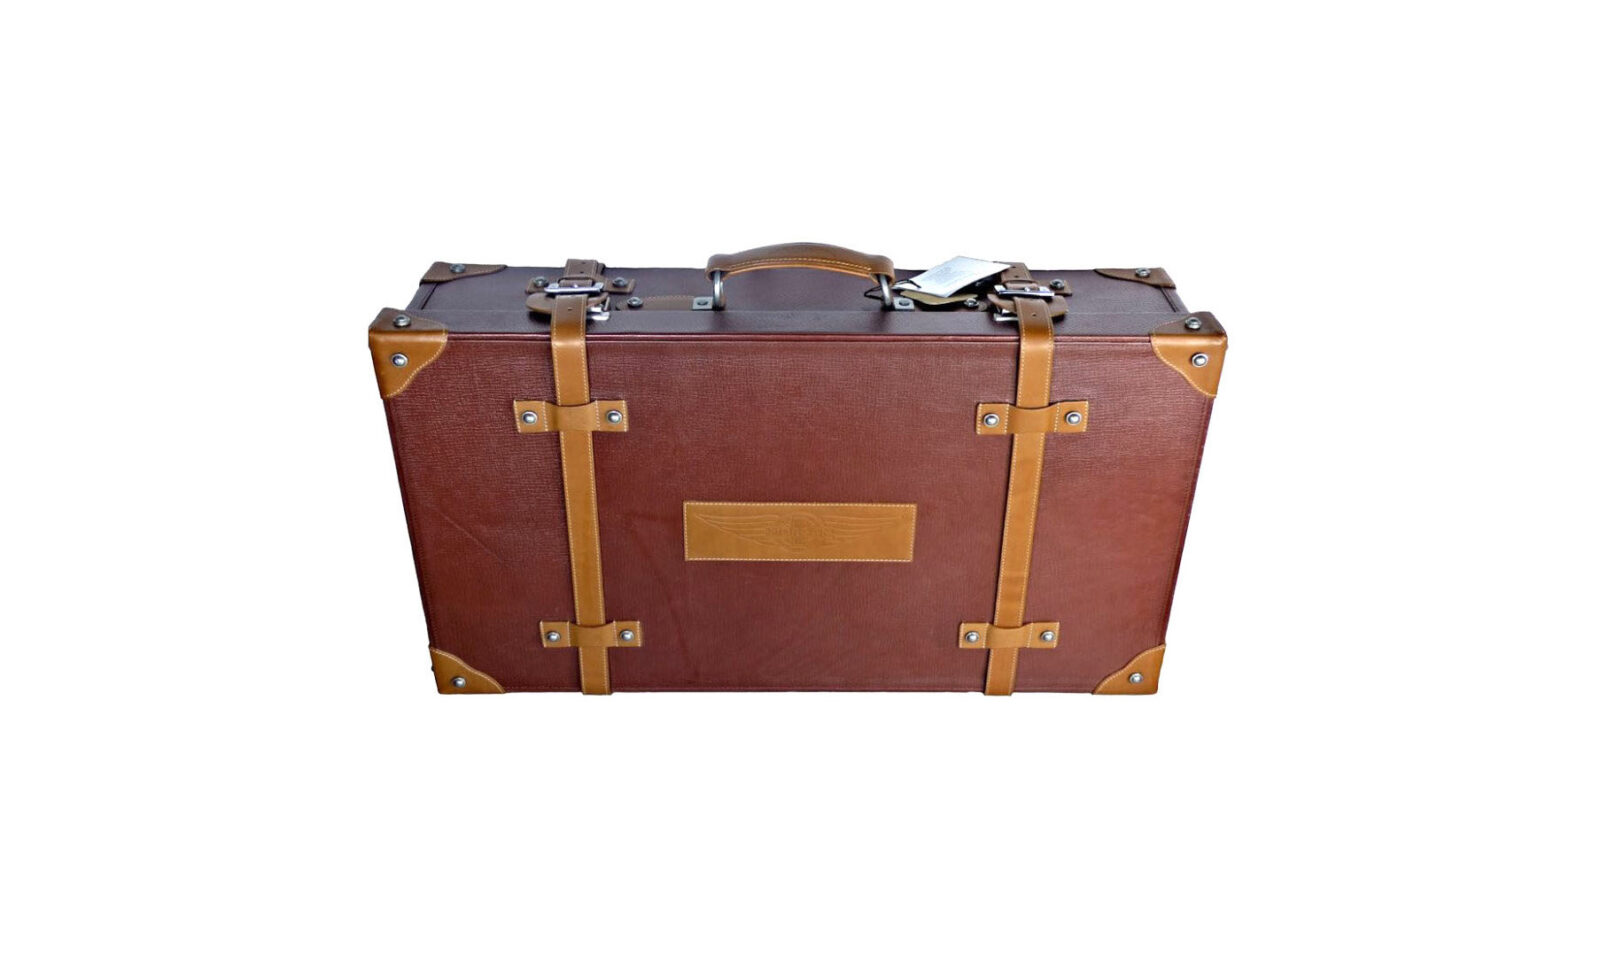 Morgan Leather Suitcase 1600x958 - Morgan Leather Suitcase